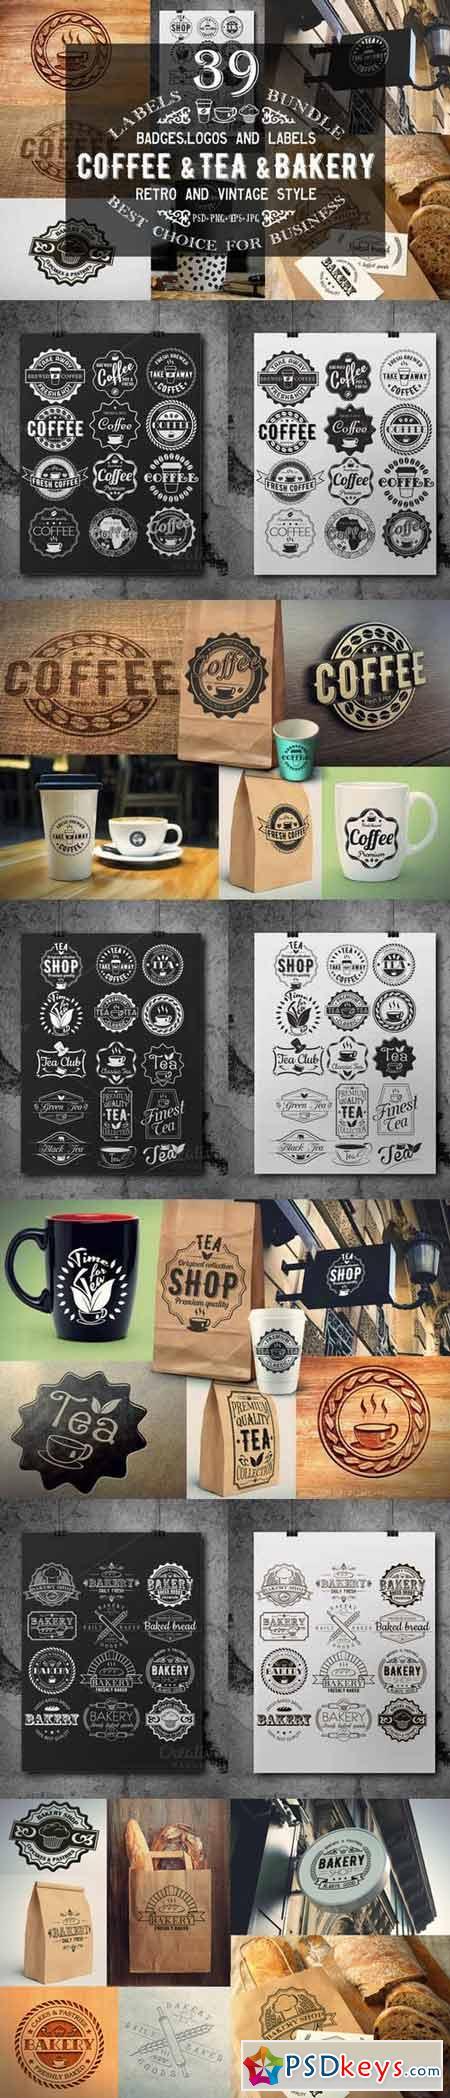 39 Coffee,Tea and Bakery logo bundle 367731